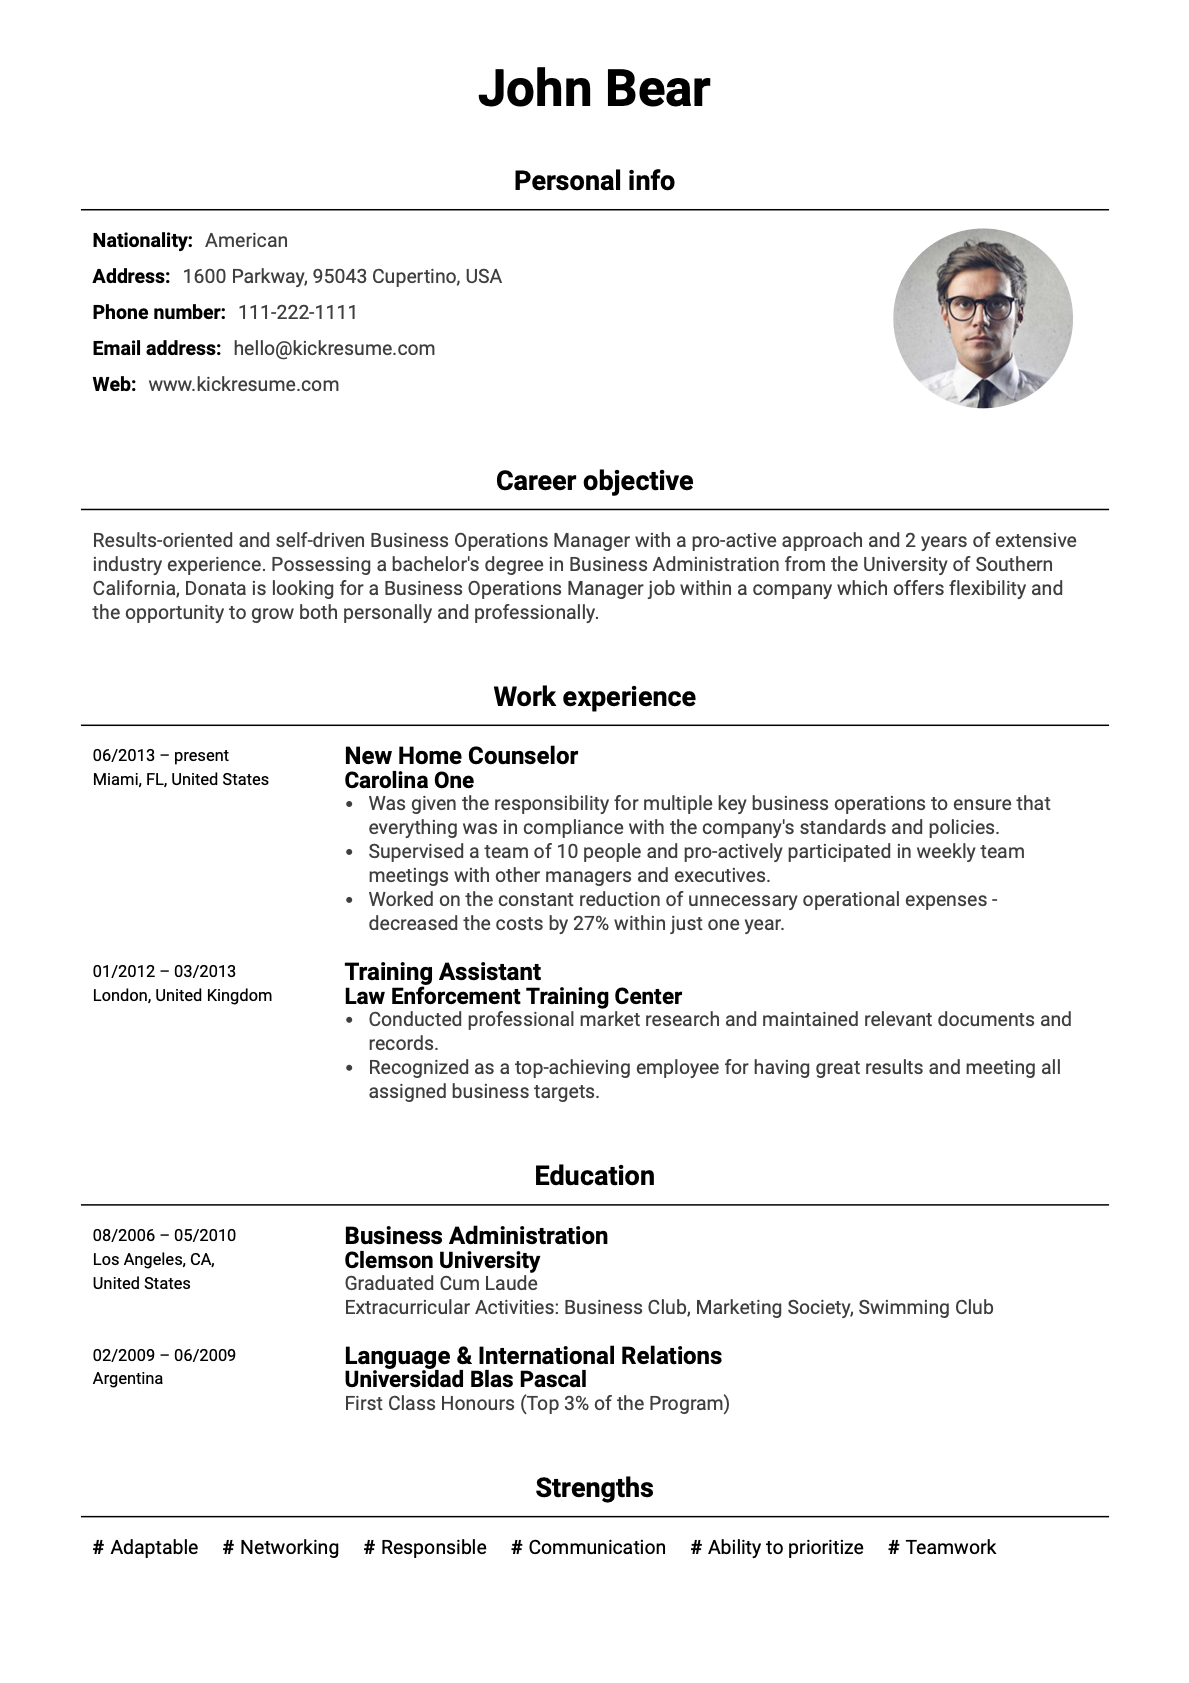 Business Operations Manager Resume Sample Job Resume Examples Cover Letter For Resume Cover Letter Builder